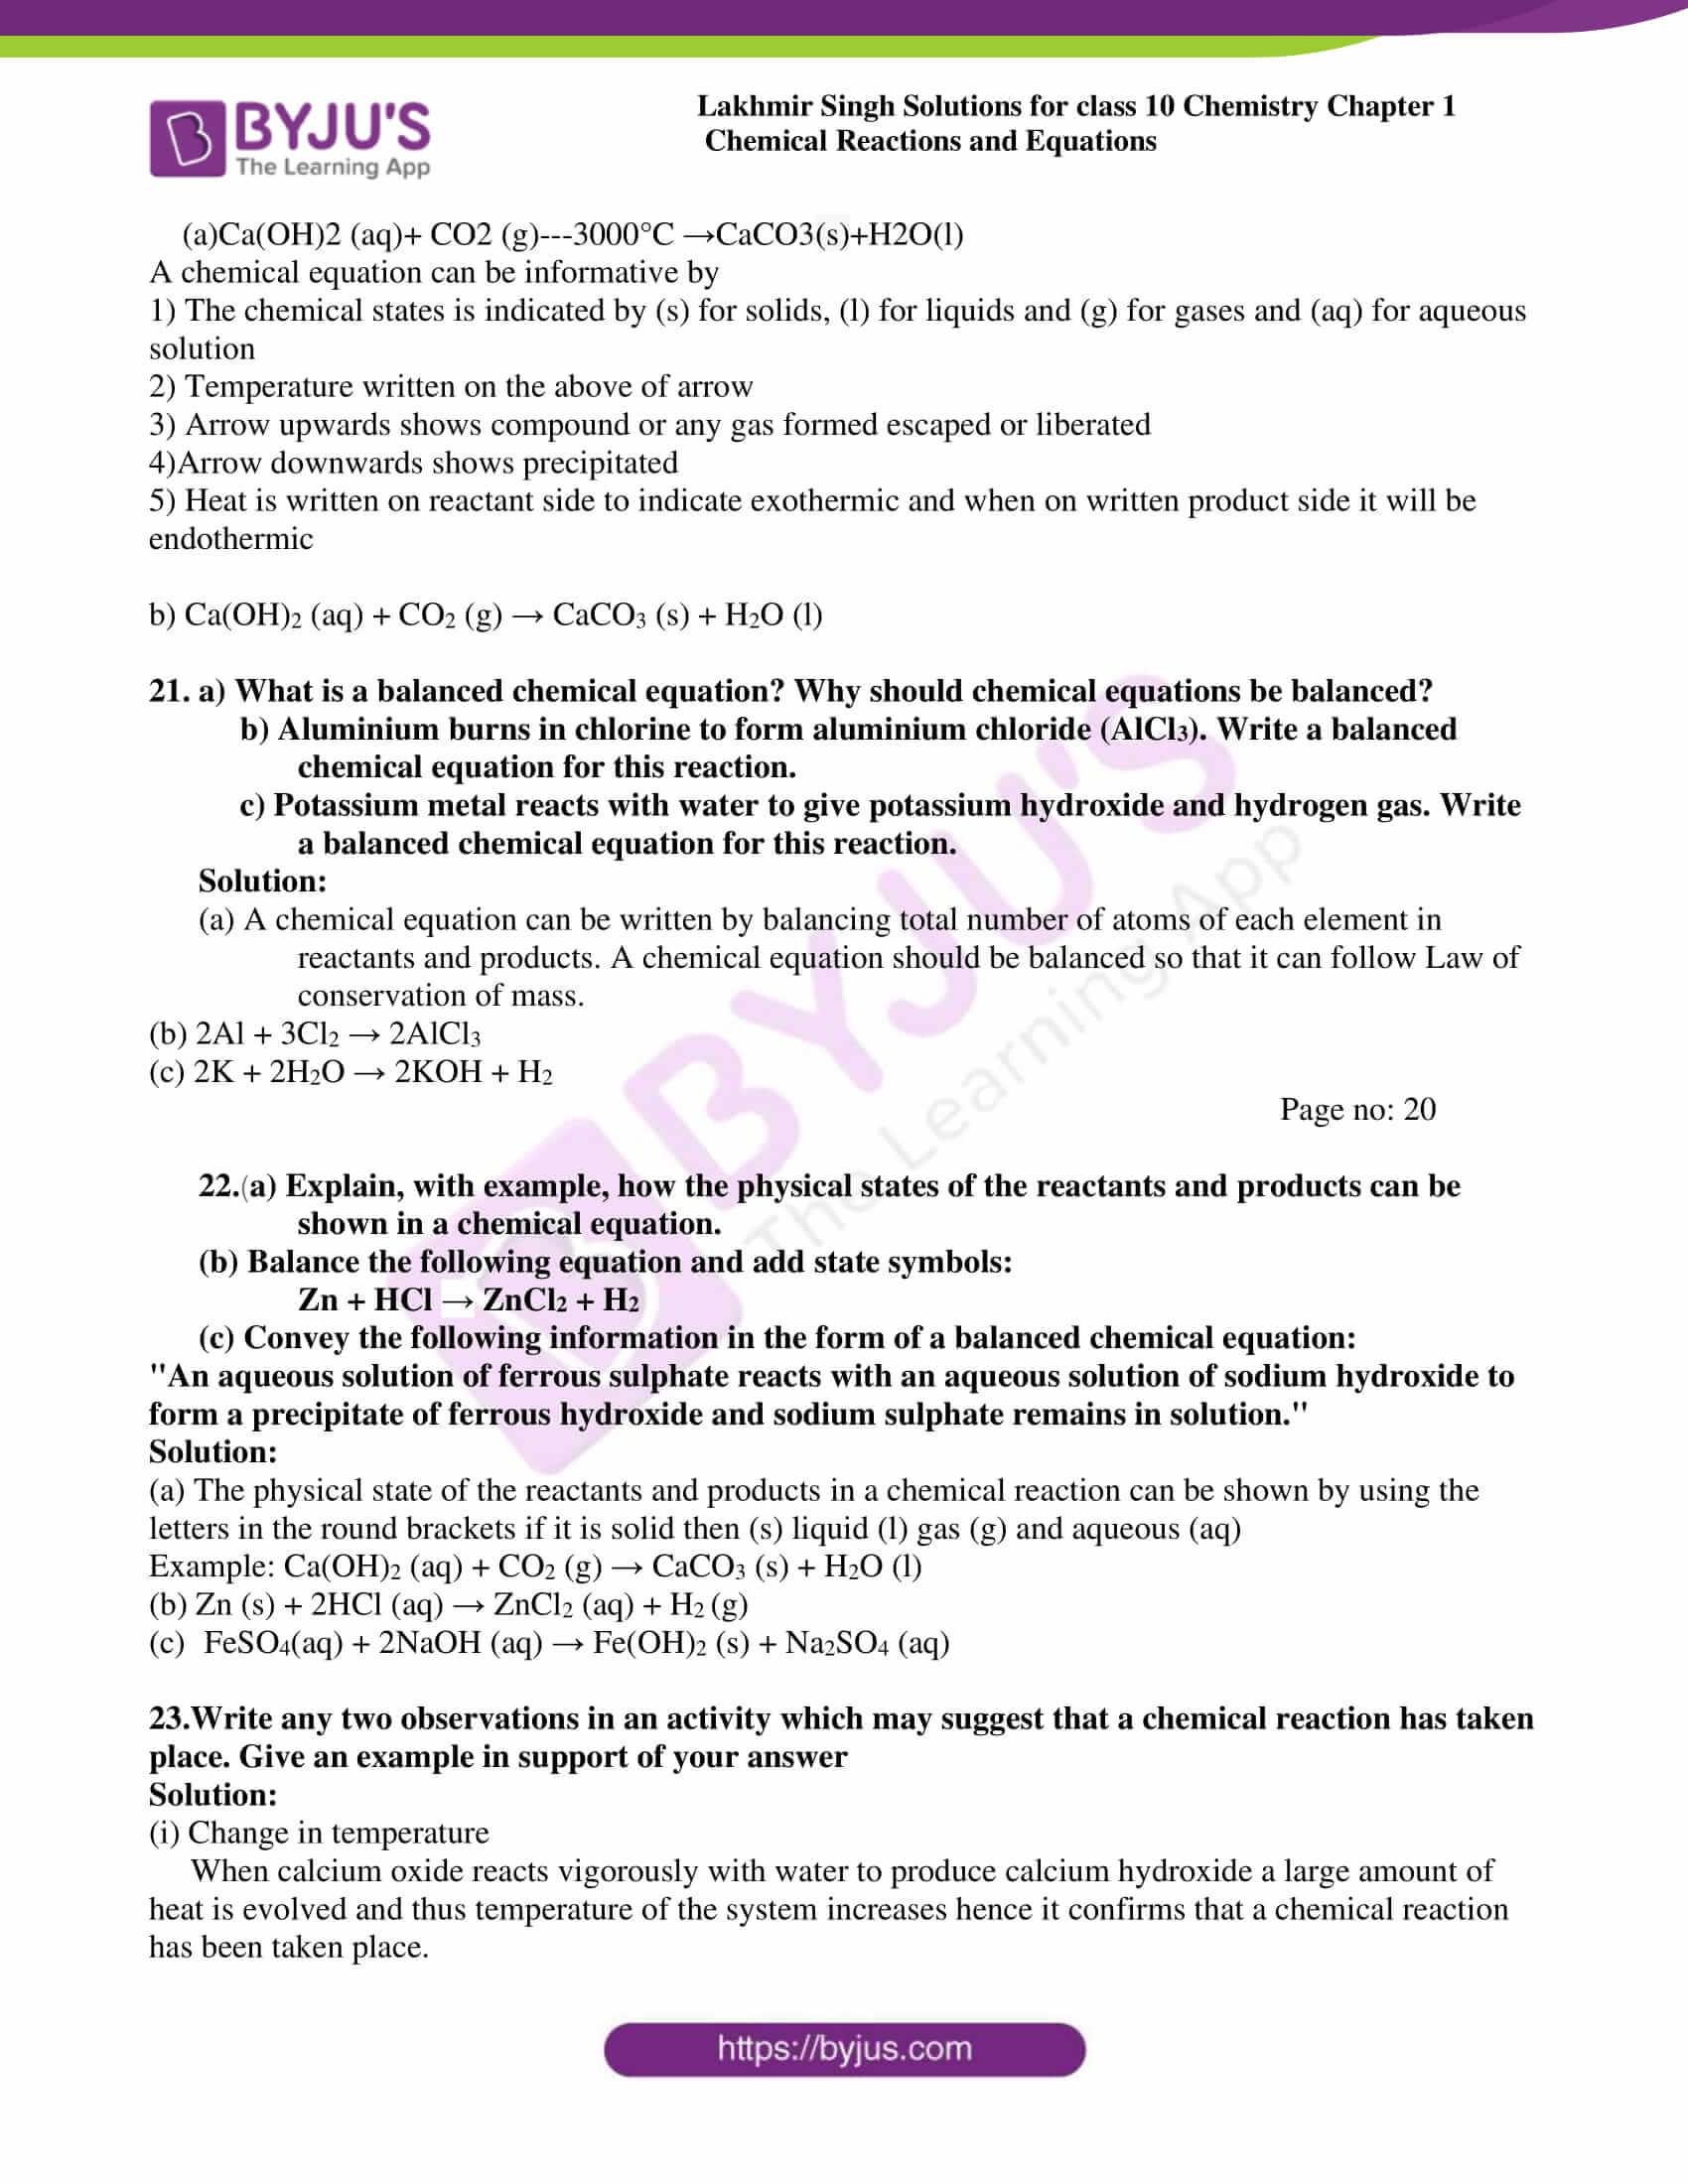 lakhmir singh sol class 10 che chapter 1 06